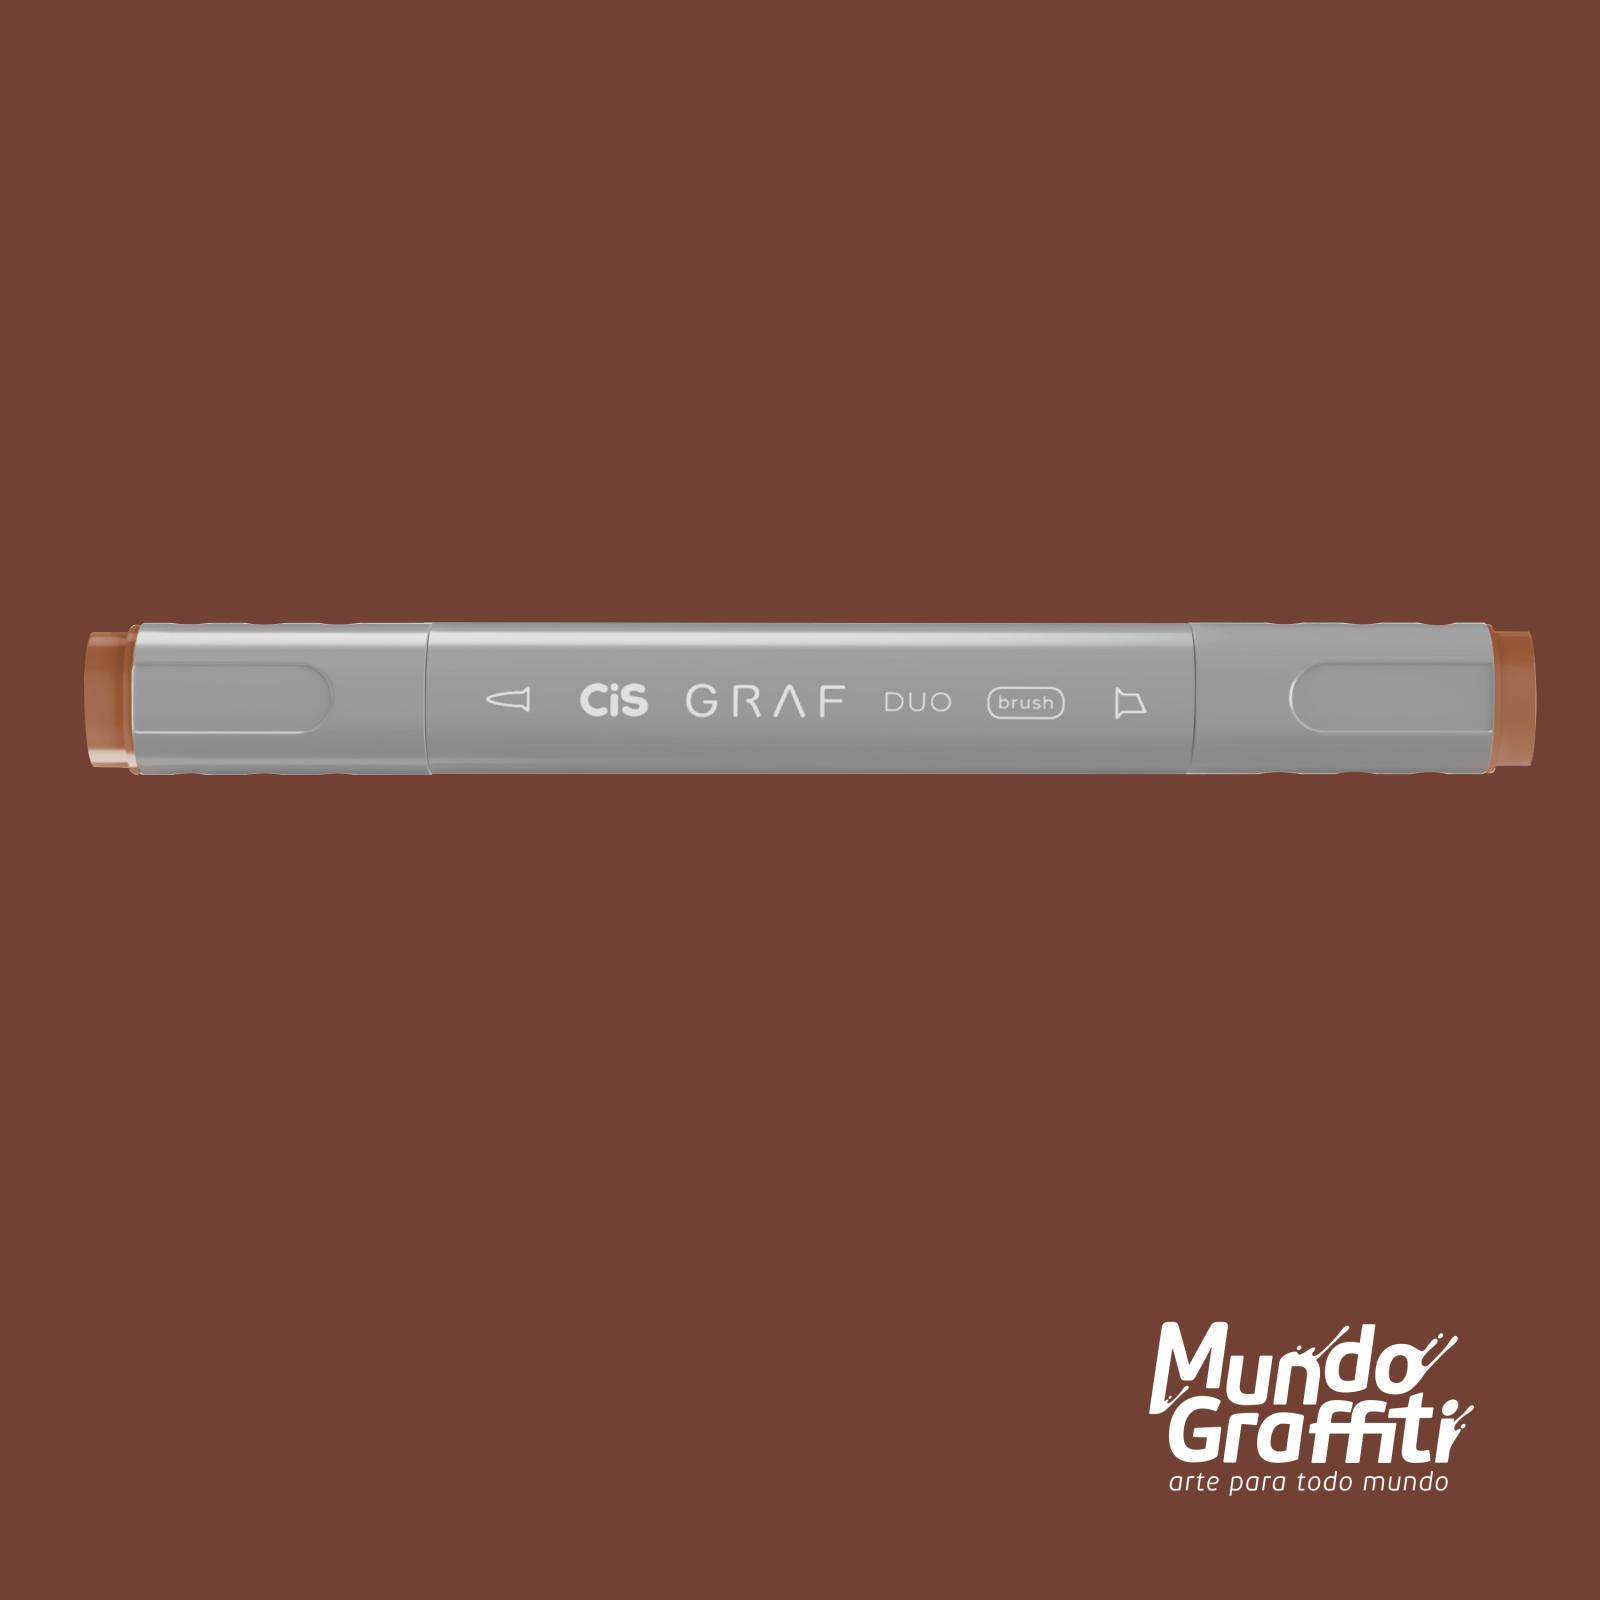 Marcador Cis Graf Duo Brush Brick Brown 94 - Mundo Graffiti